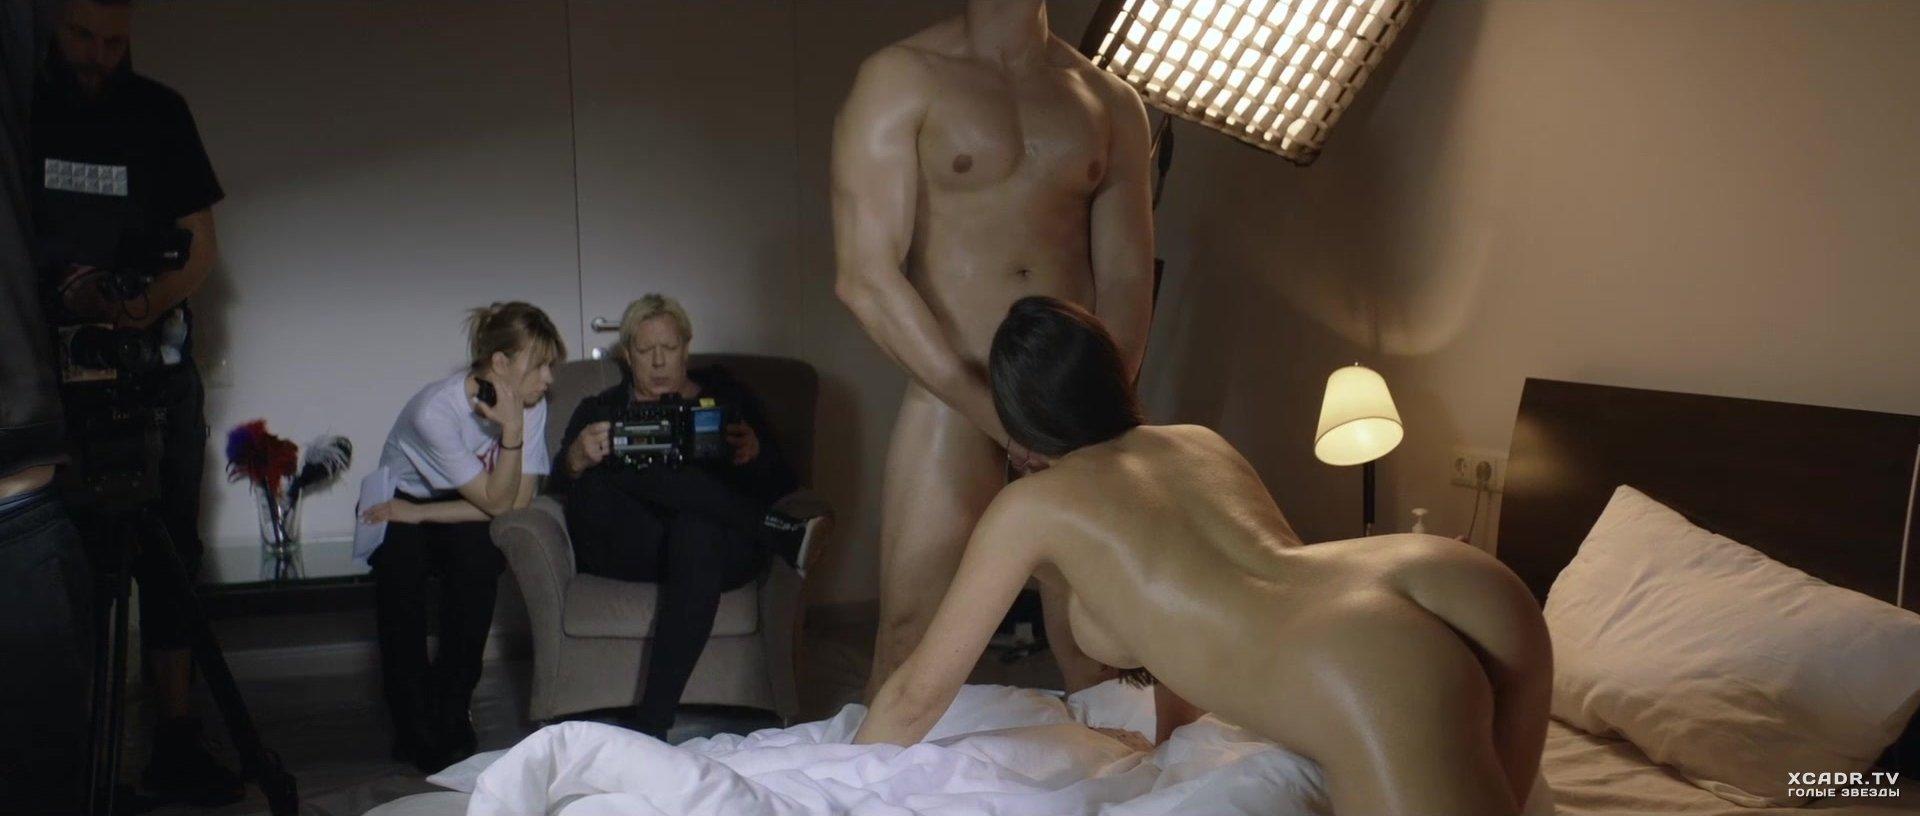 Ночи Спальная Порно Лена